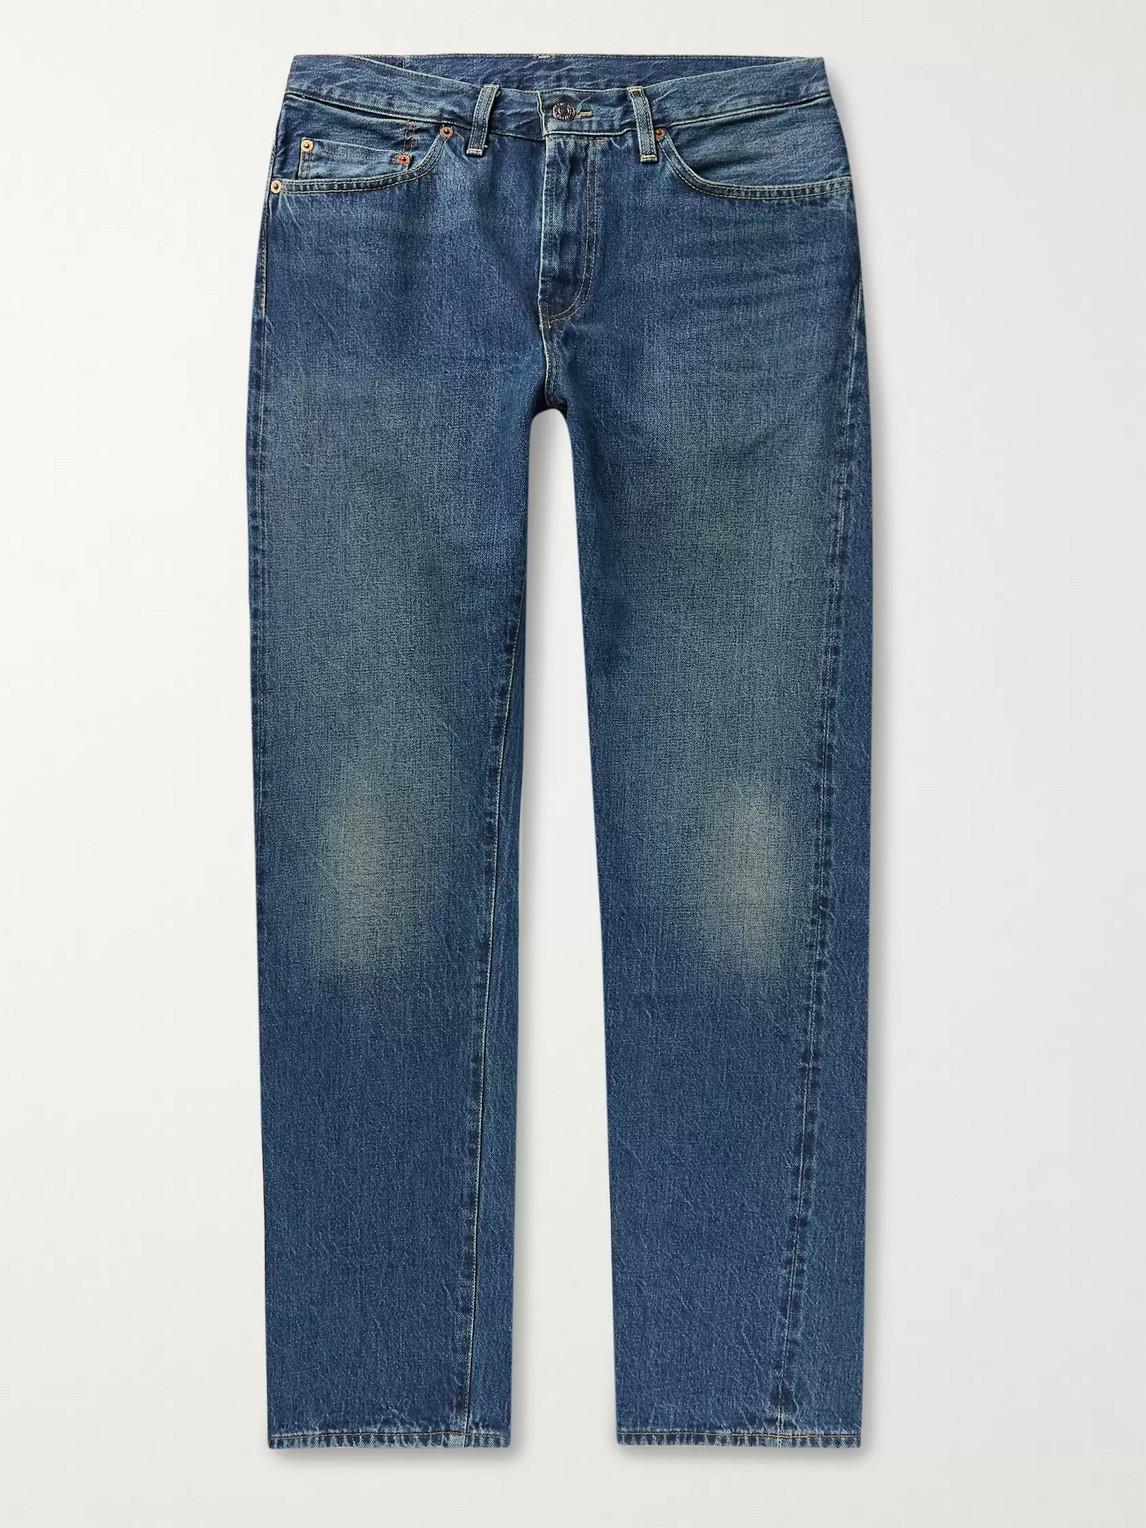 levi's vintage clothing - 1954 501 original selvedge-denim jeans - men - blue